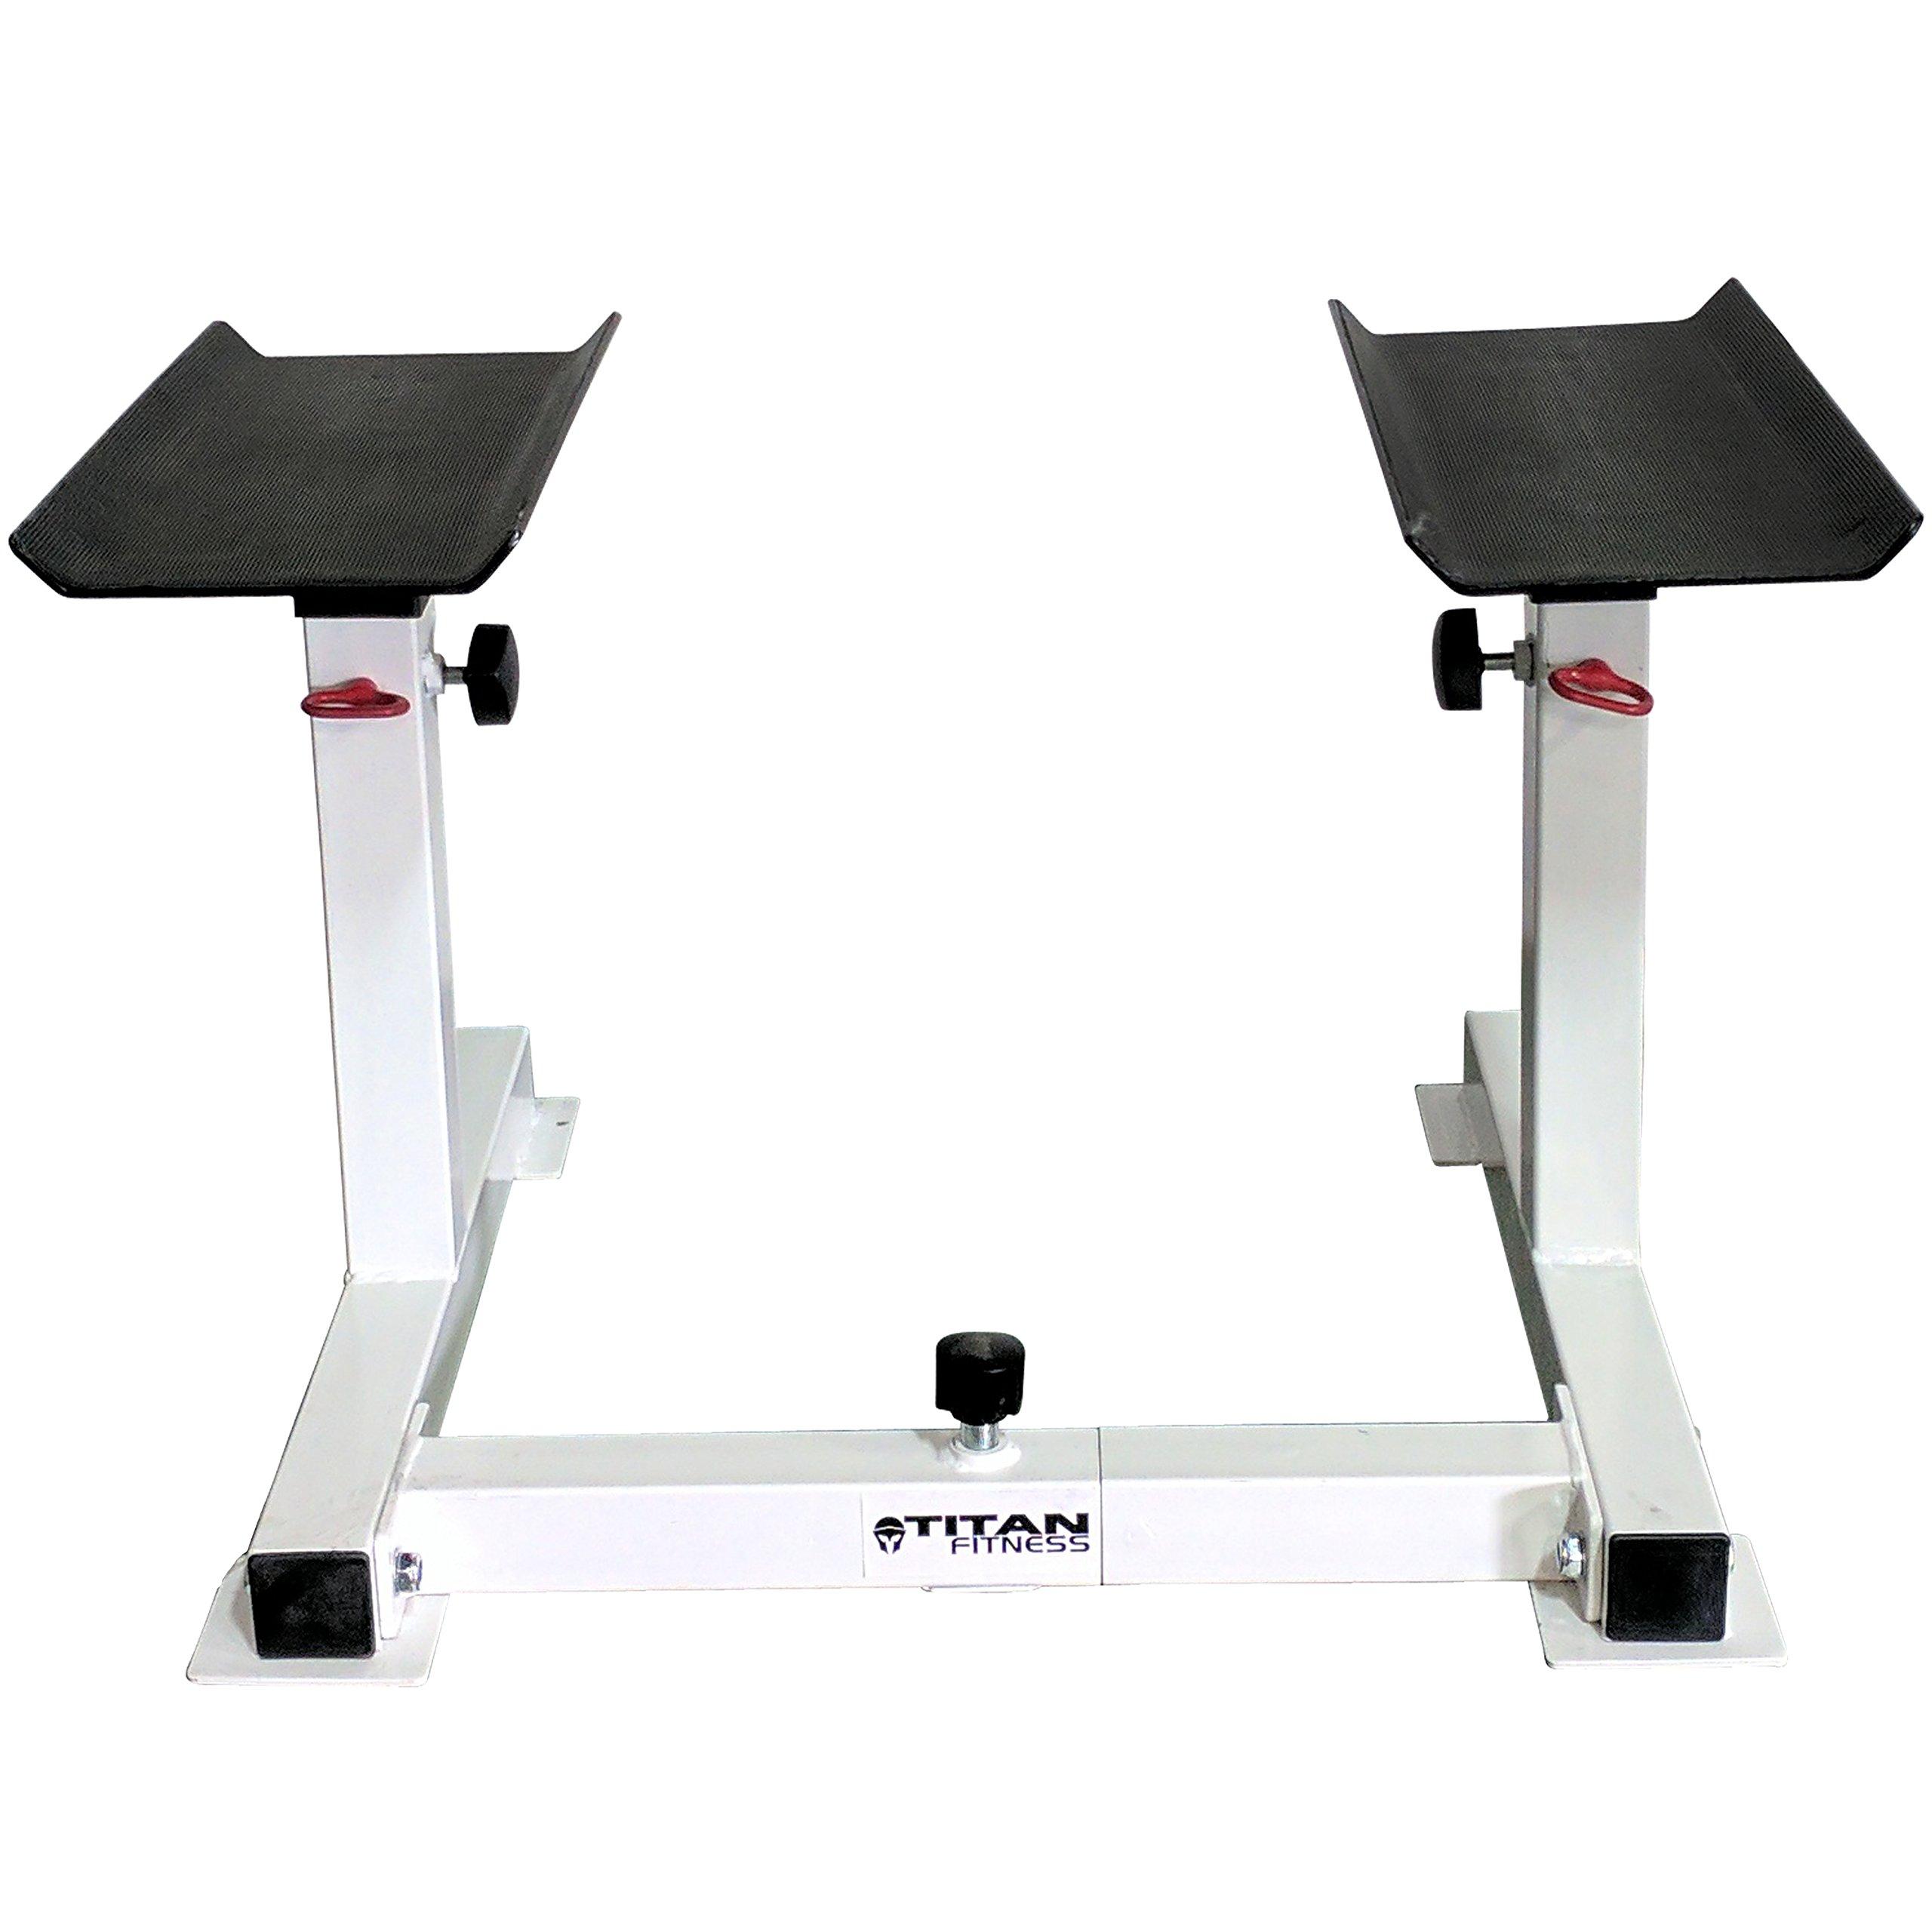 Titan Adjustable Height Dumbbell Holder by Titan Fitness (Image #2)